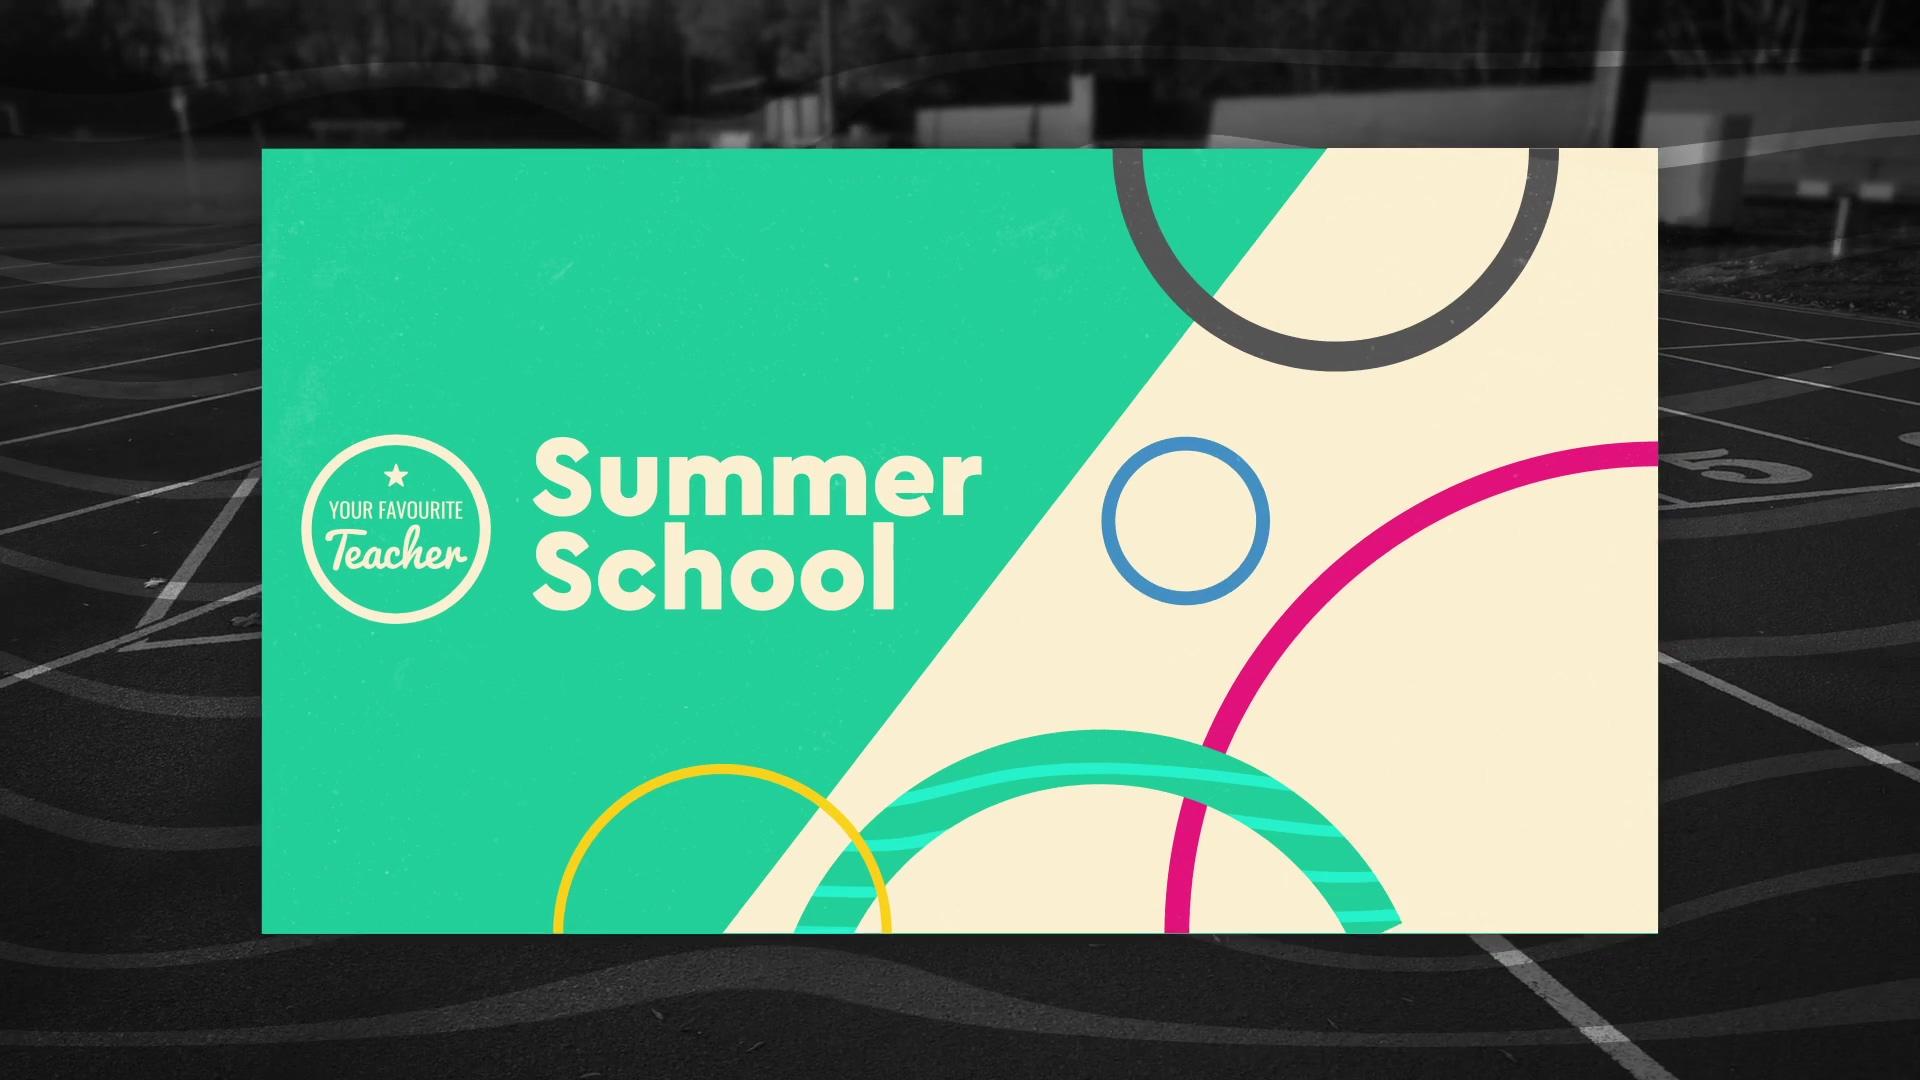 Students Summer School Promo 01 (1) (1)-1